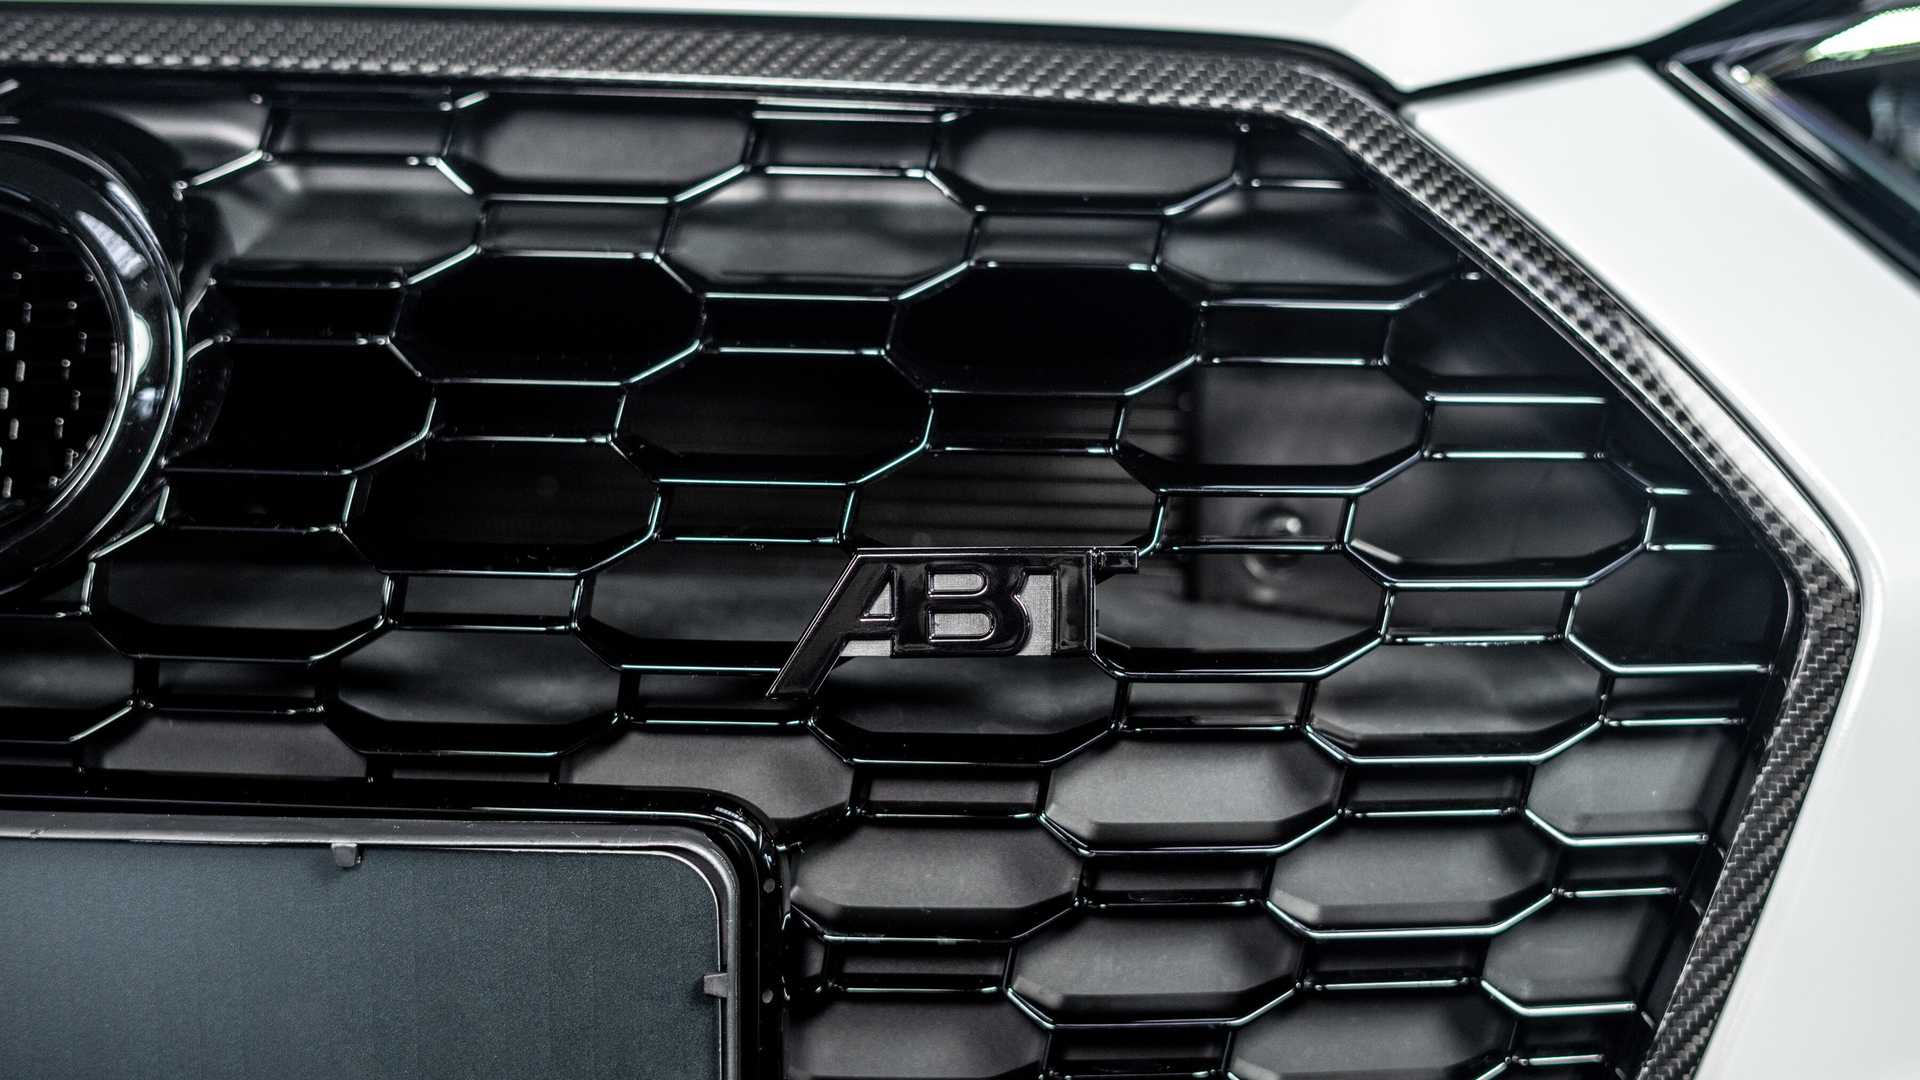 ABT RS-5R Sportback